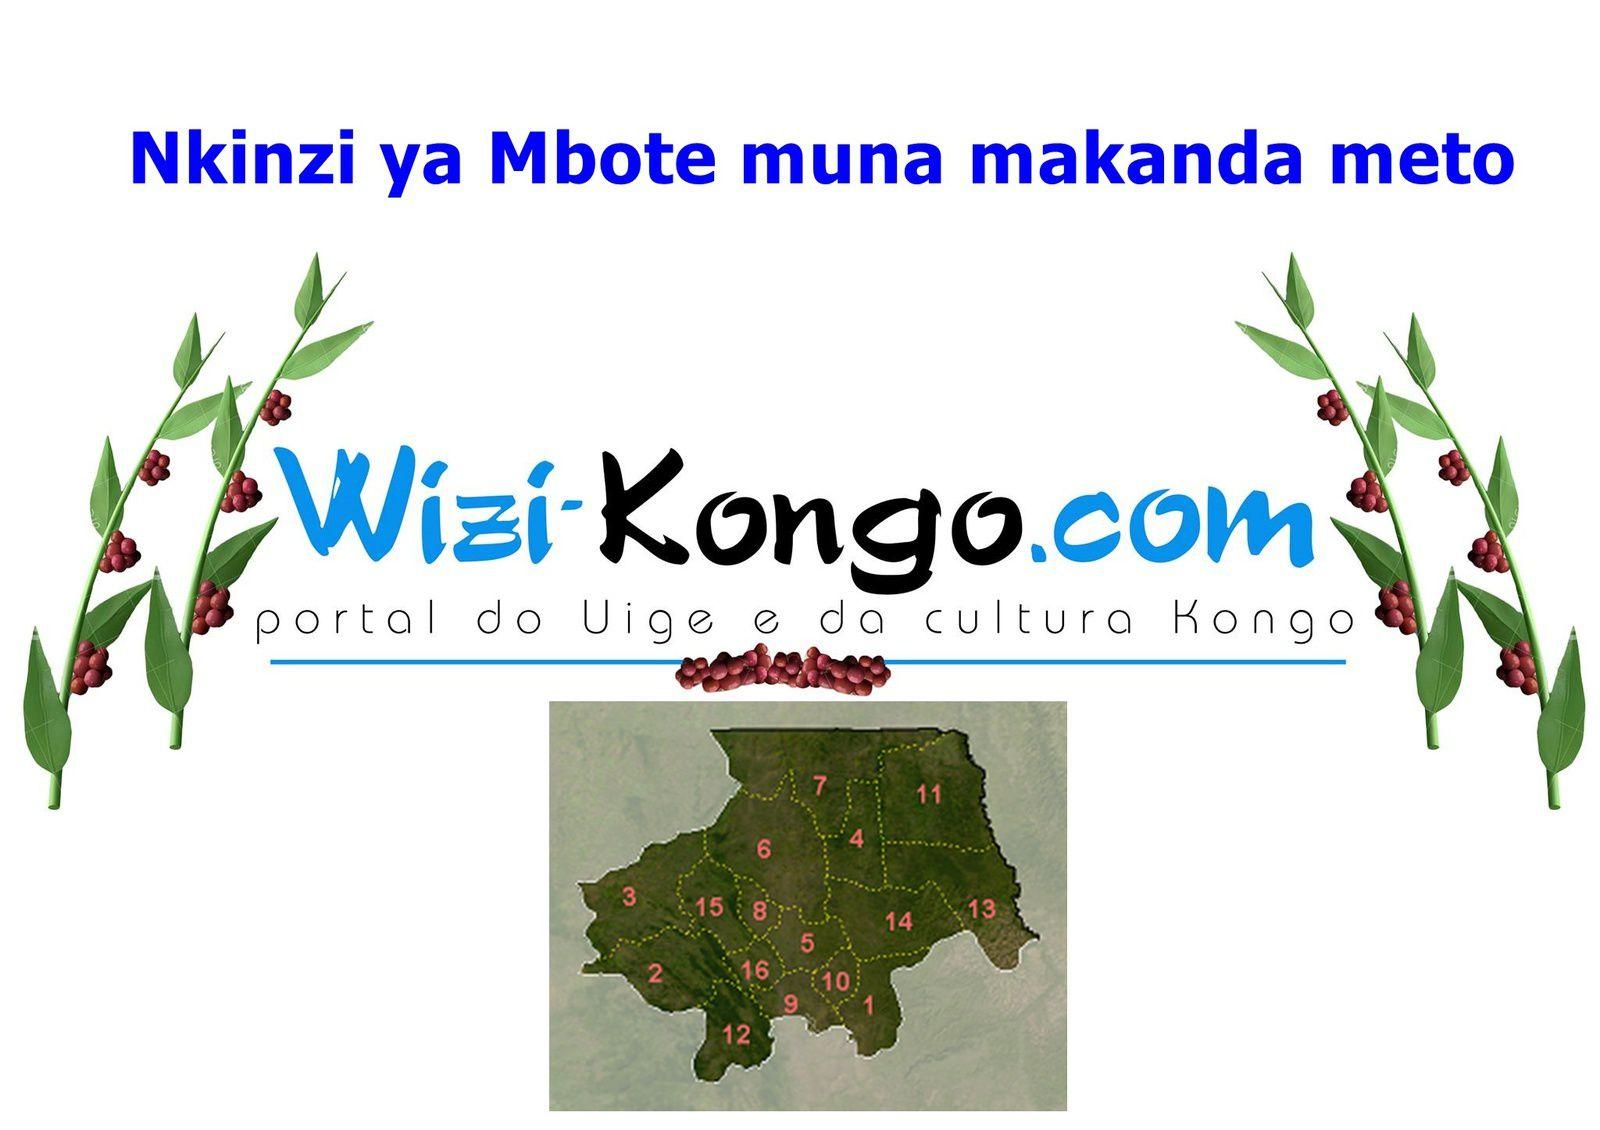 Adeus MUANA DAMBA e Viva MUNDAMBA e WIZI-KONGO